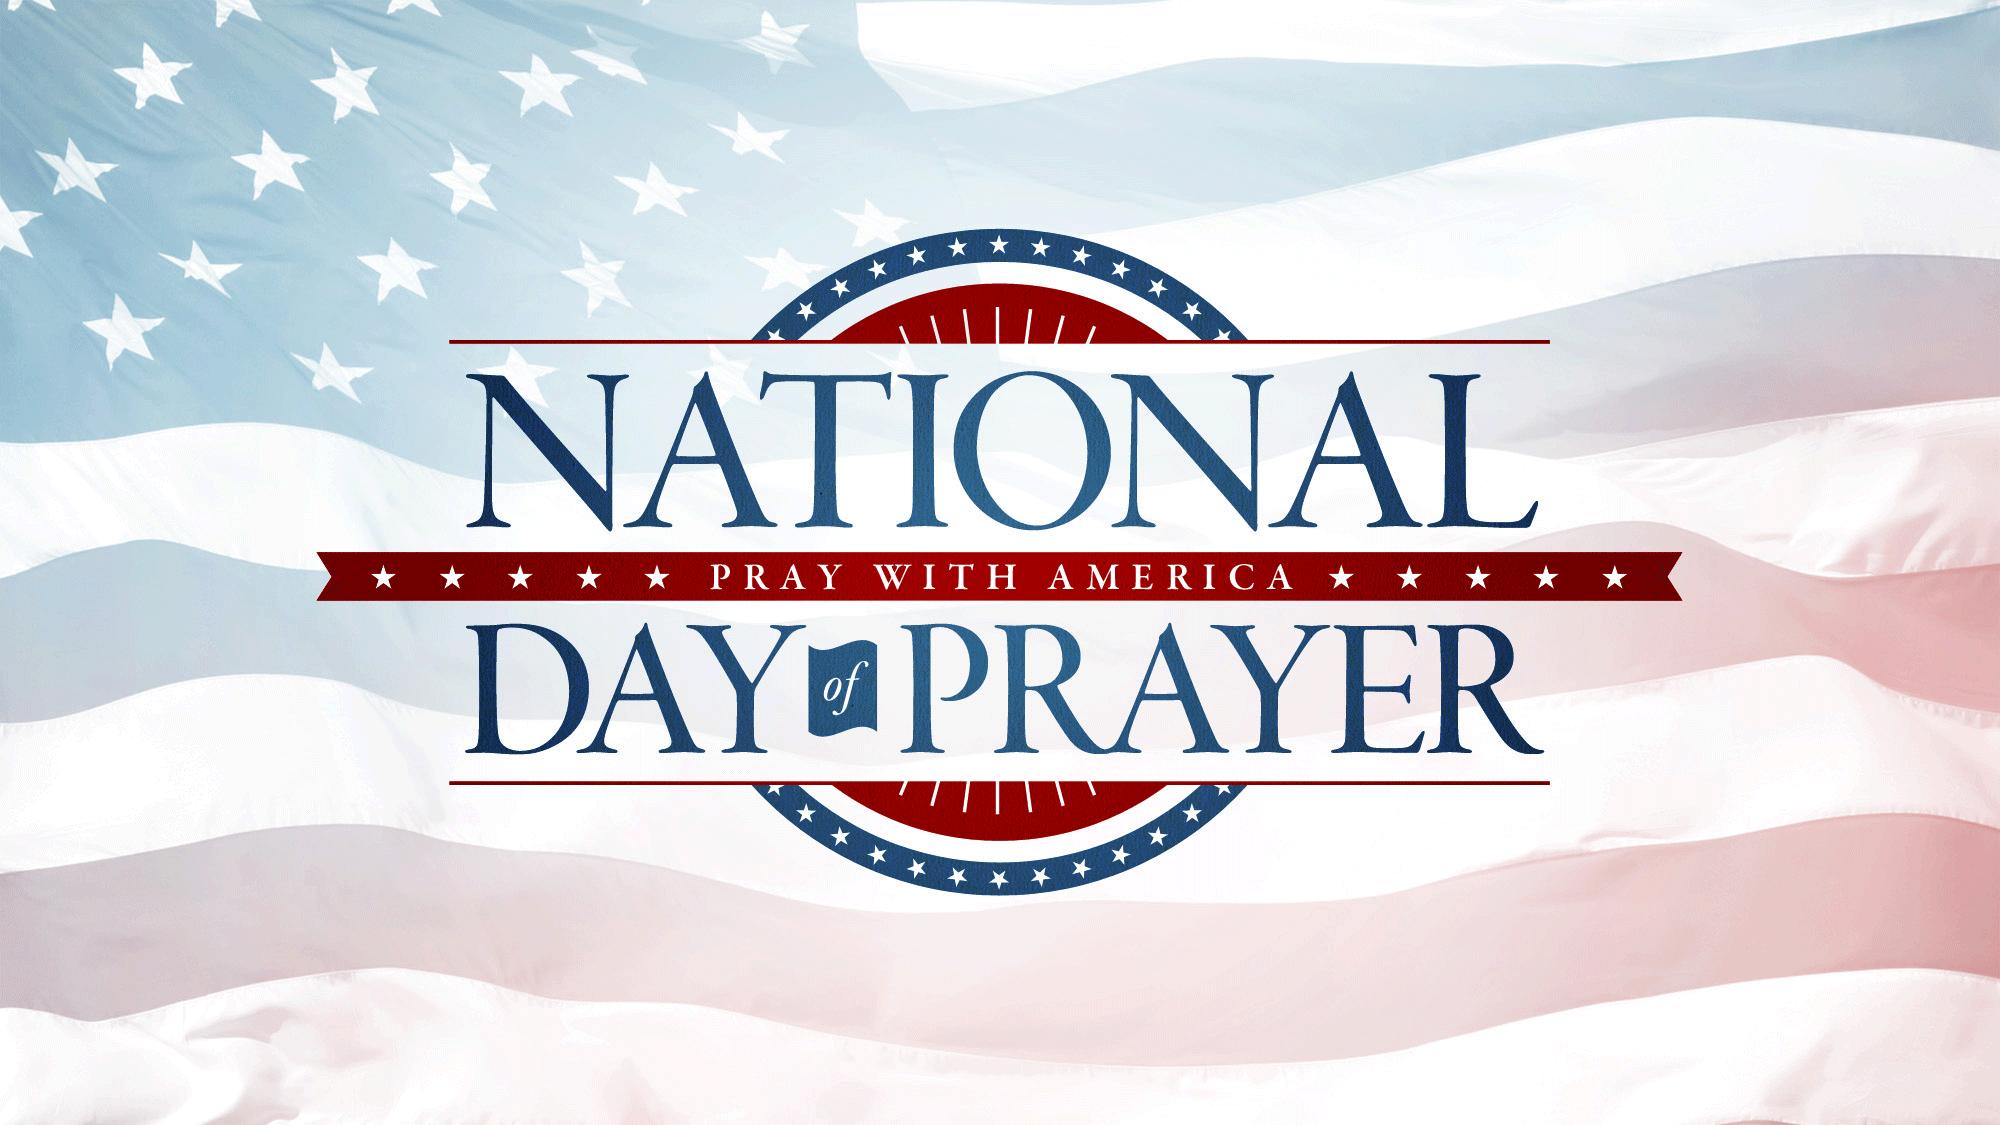 National Day of Prayer Interactive Prayer Experience.